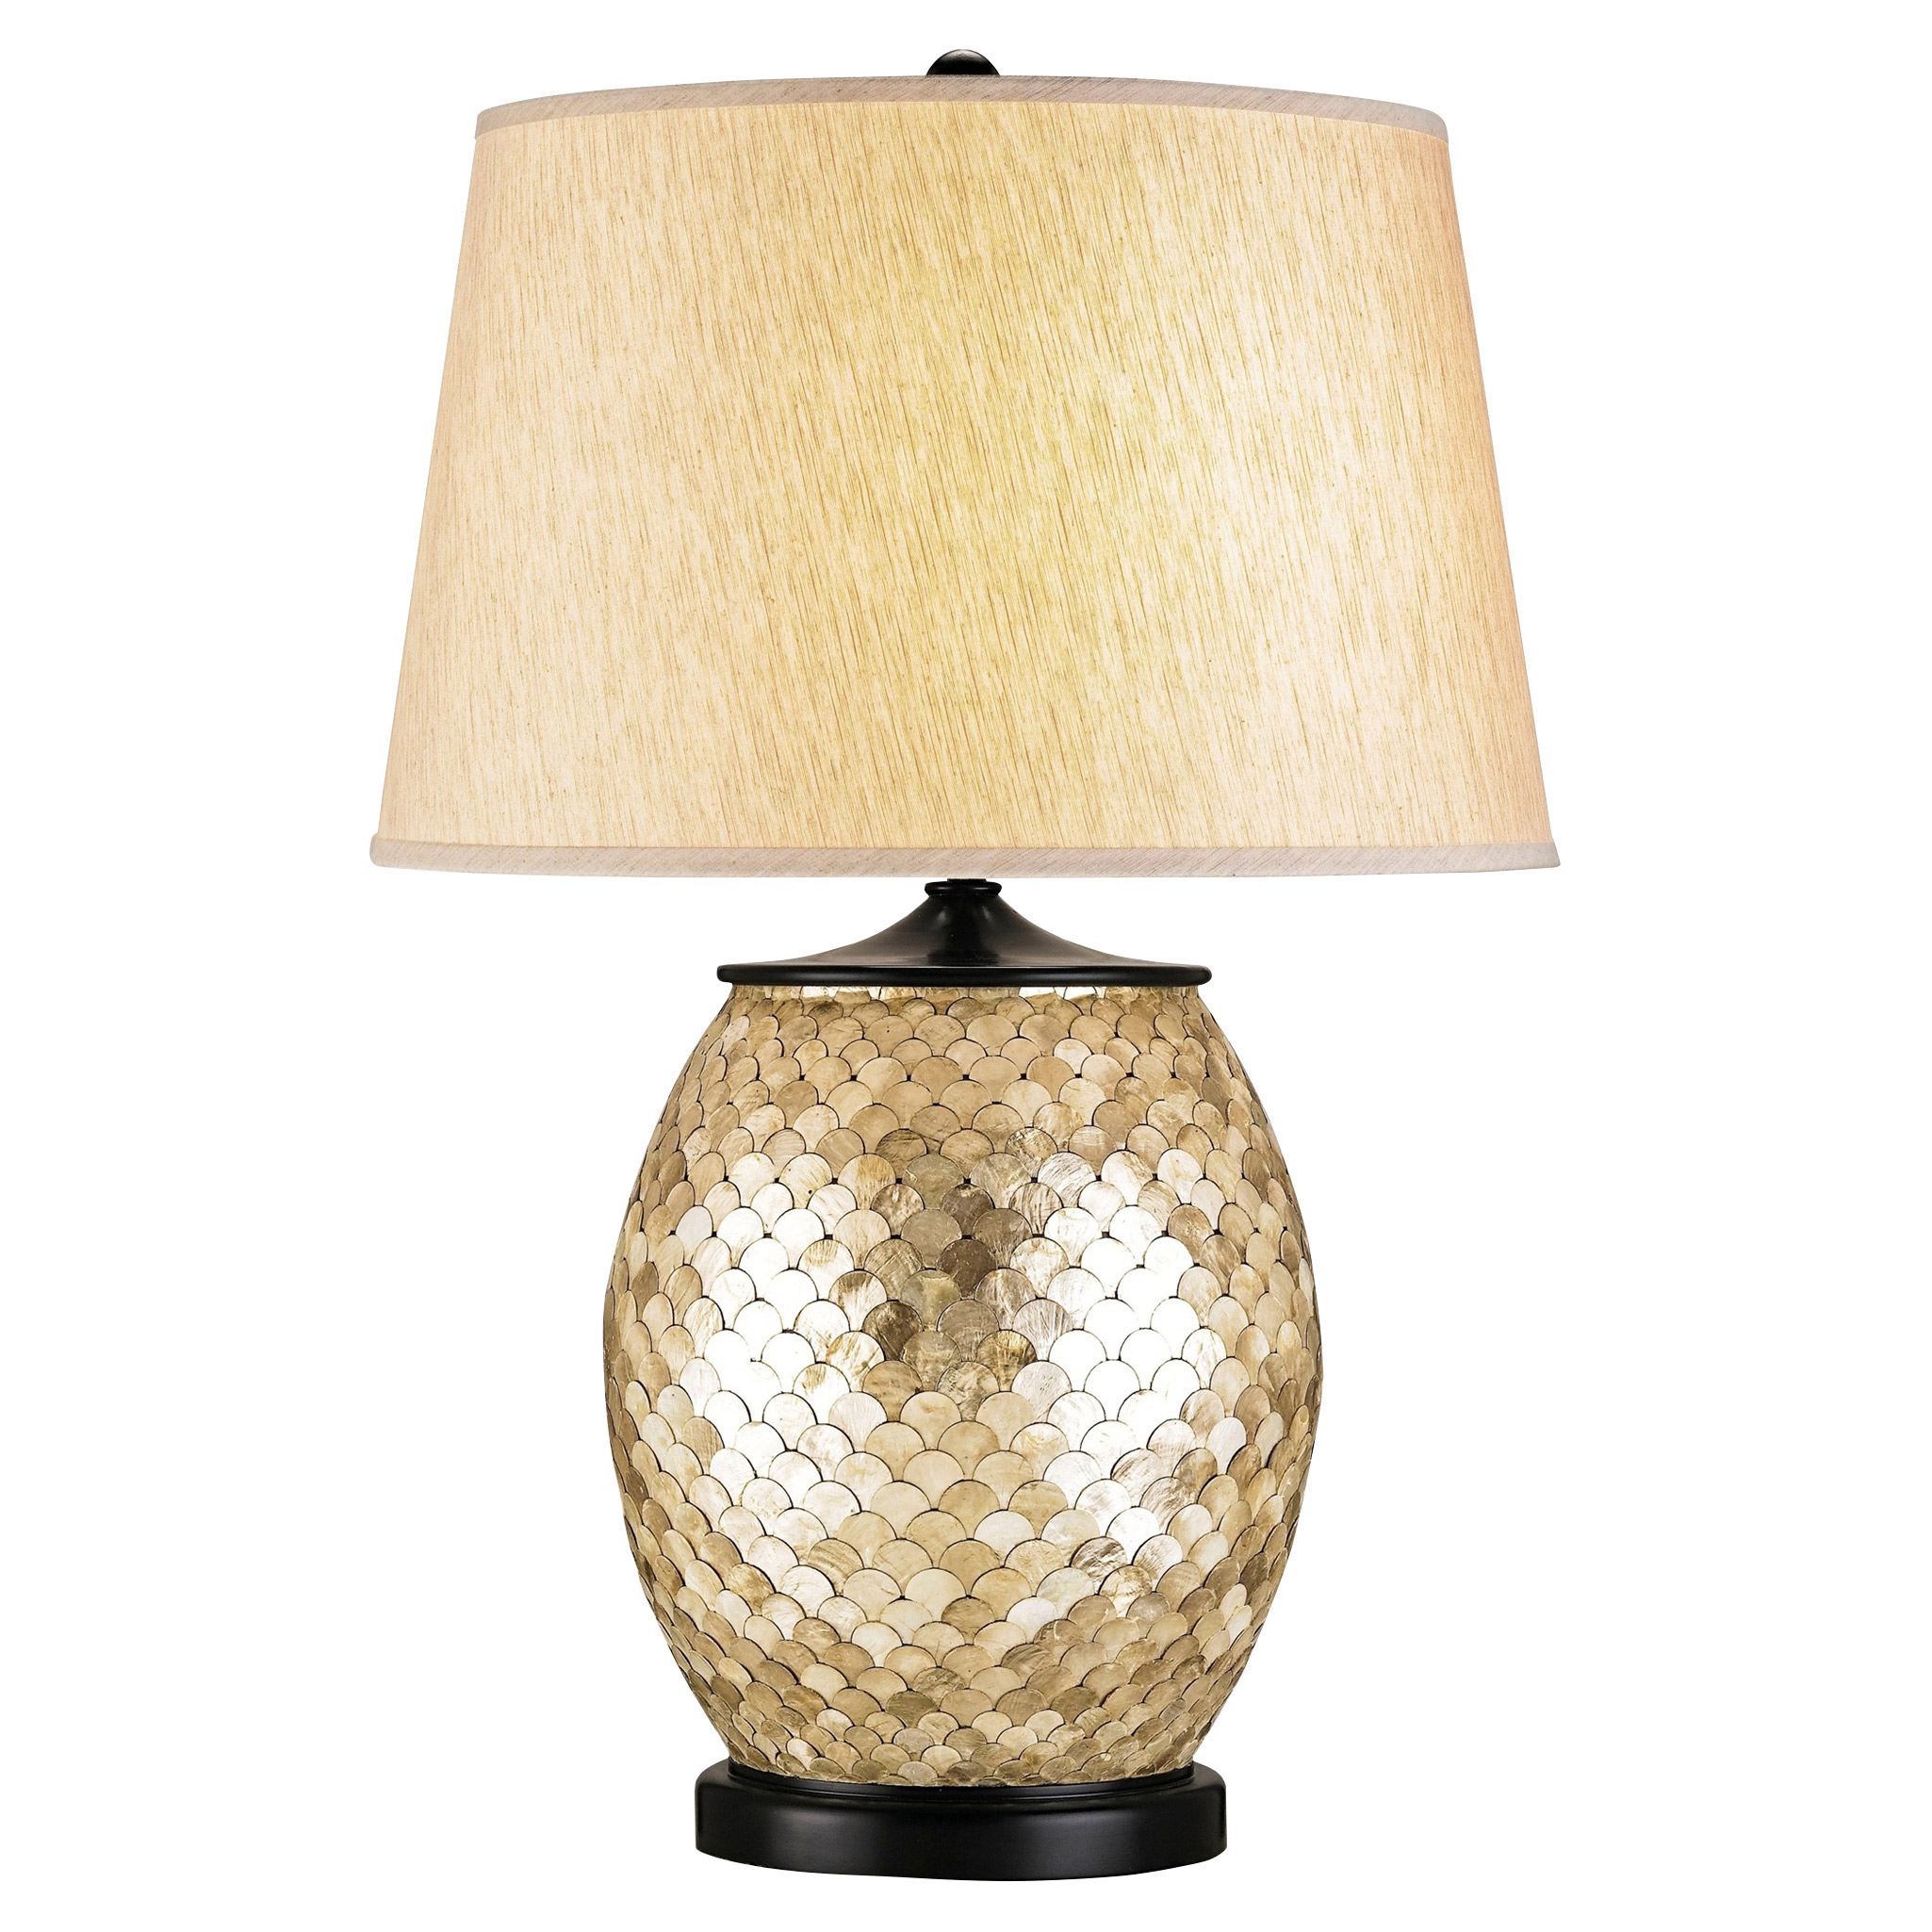 Bedelia Coastal Beach Gilded Gold Scale Table Lamp